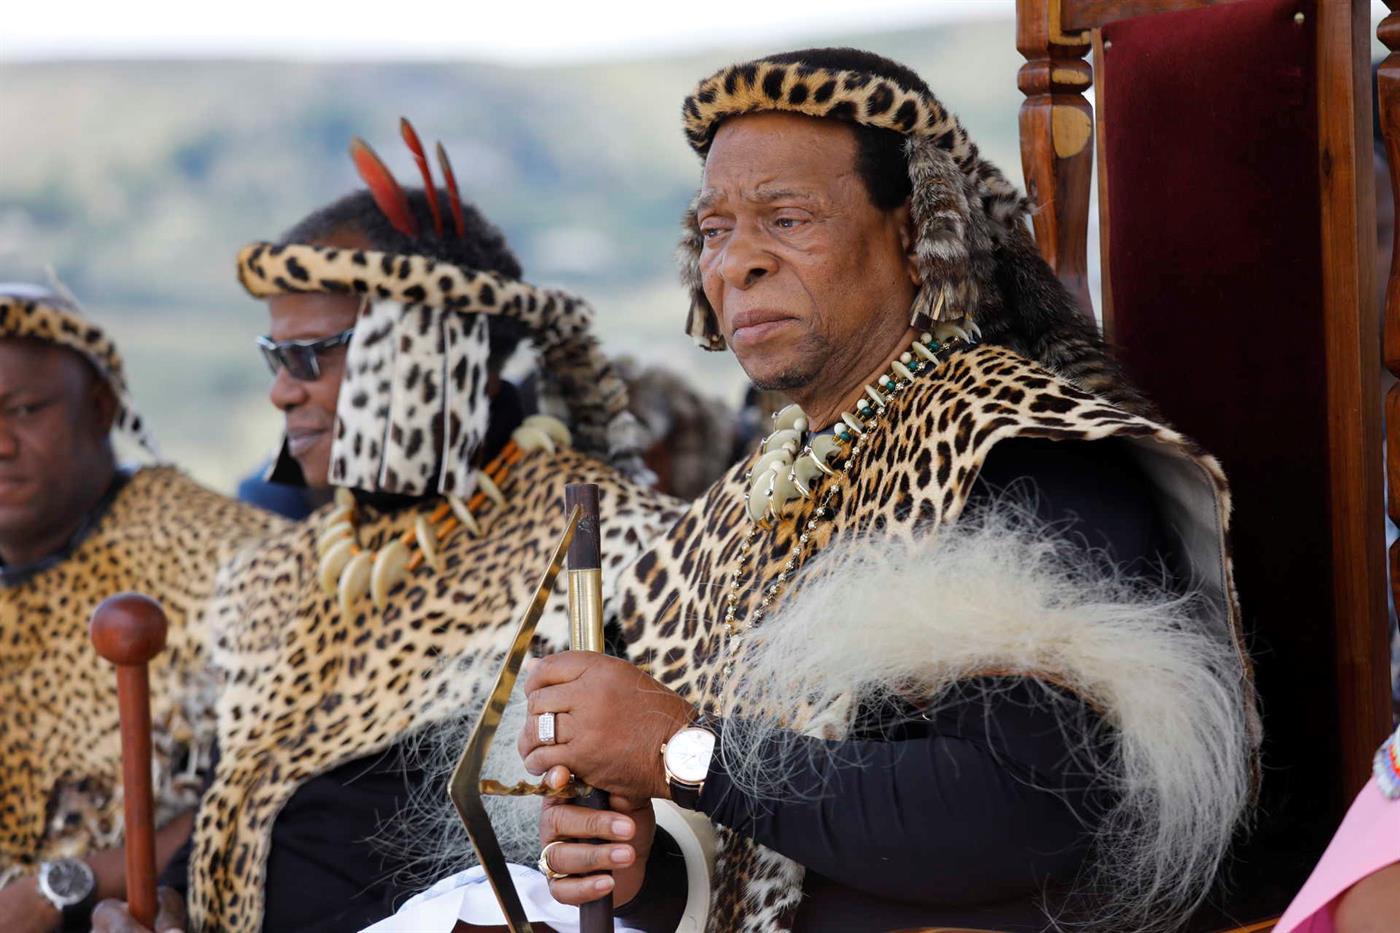 O rei zulu Goodwill Zwelithini numa foto de 2019. O monarca morreu a 12 de março, aos 72 anos, após meio